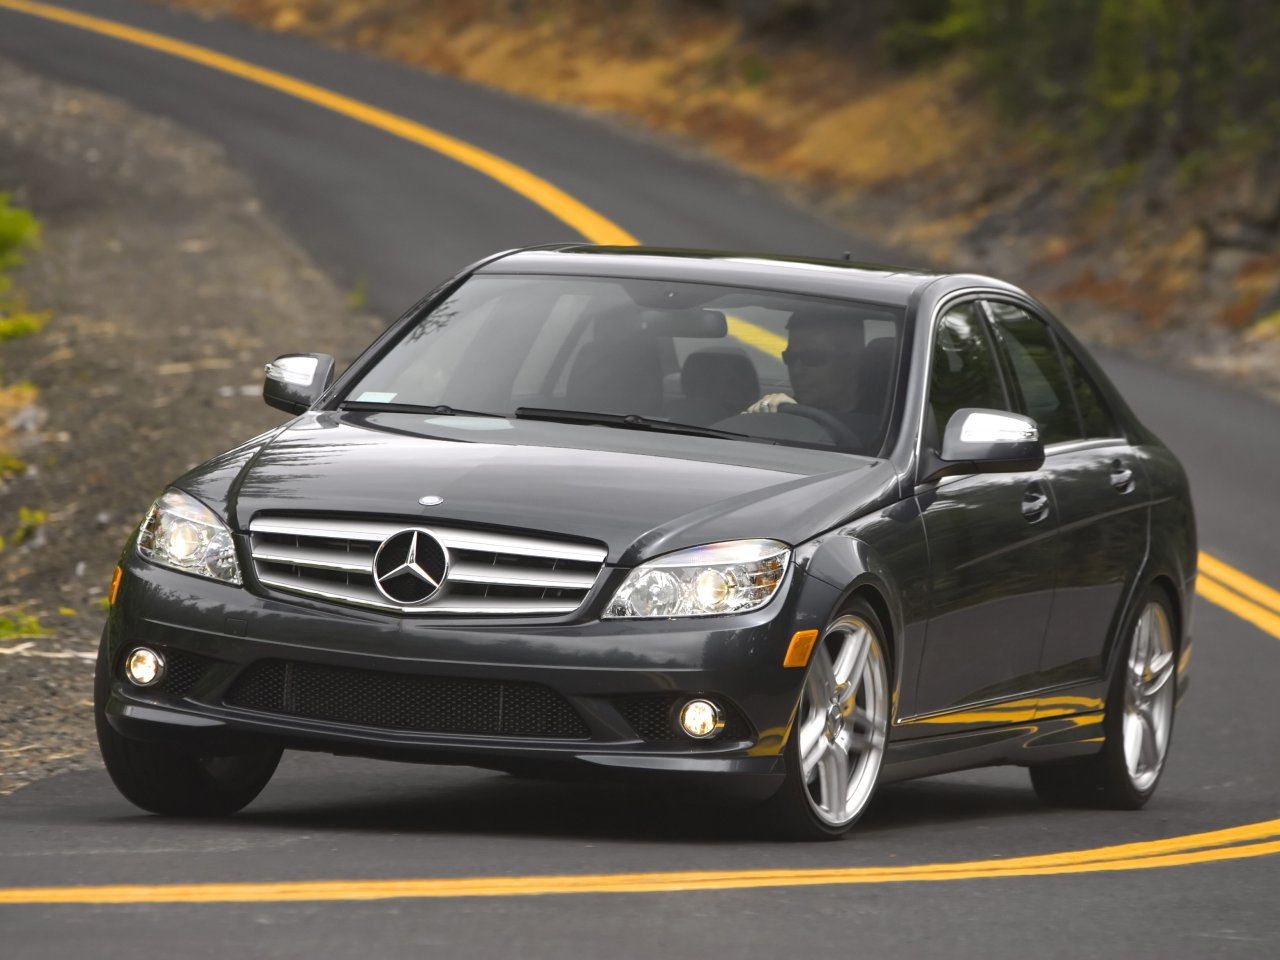 2012 mercedes benz c class new car modification review. Black Bedroom Furniture Sets. Home Design Ideas